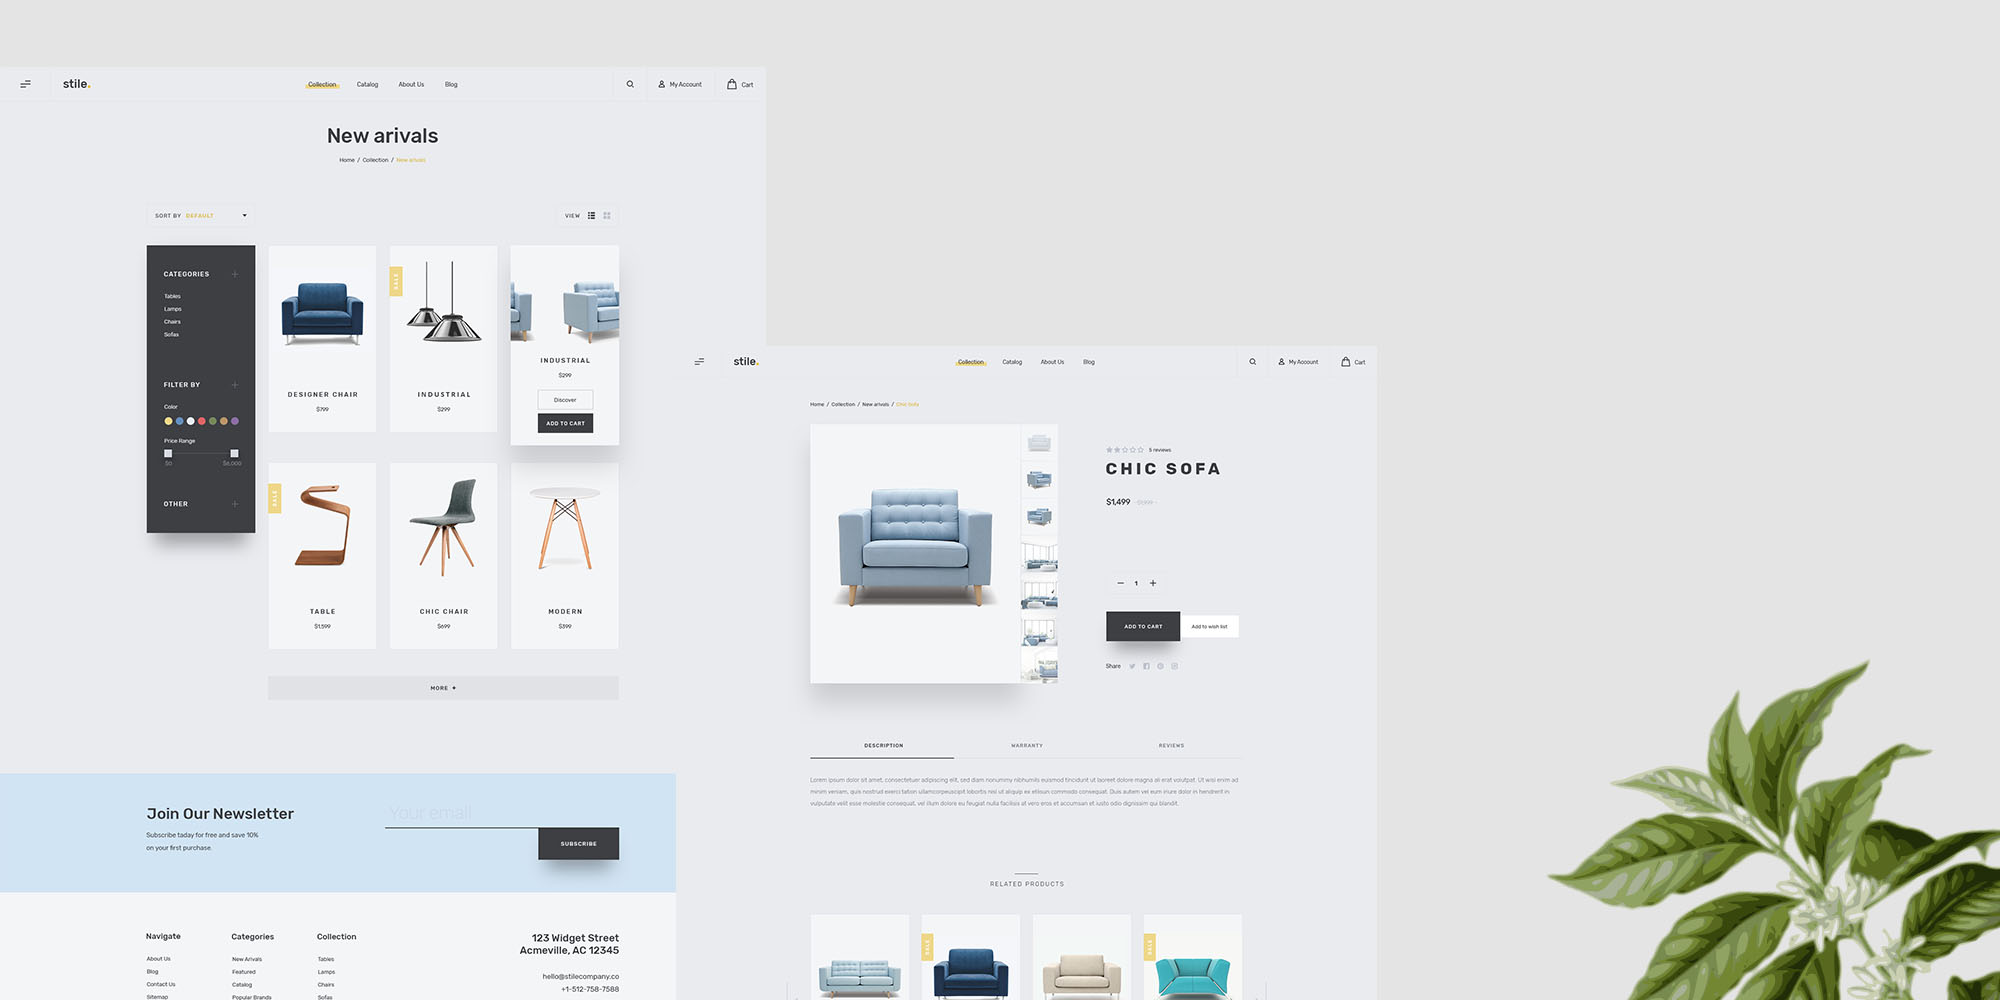 digital marketing and web design agency in dubai